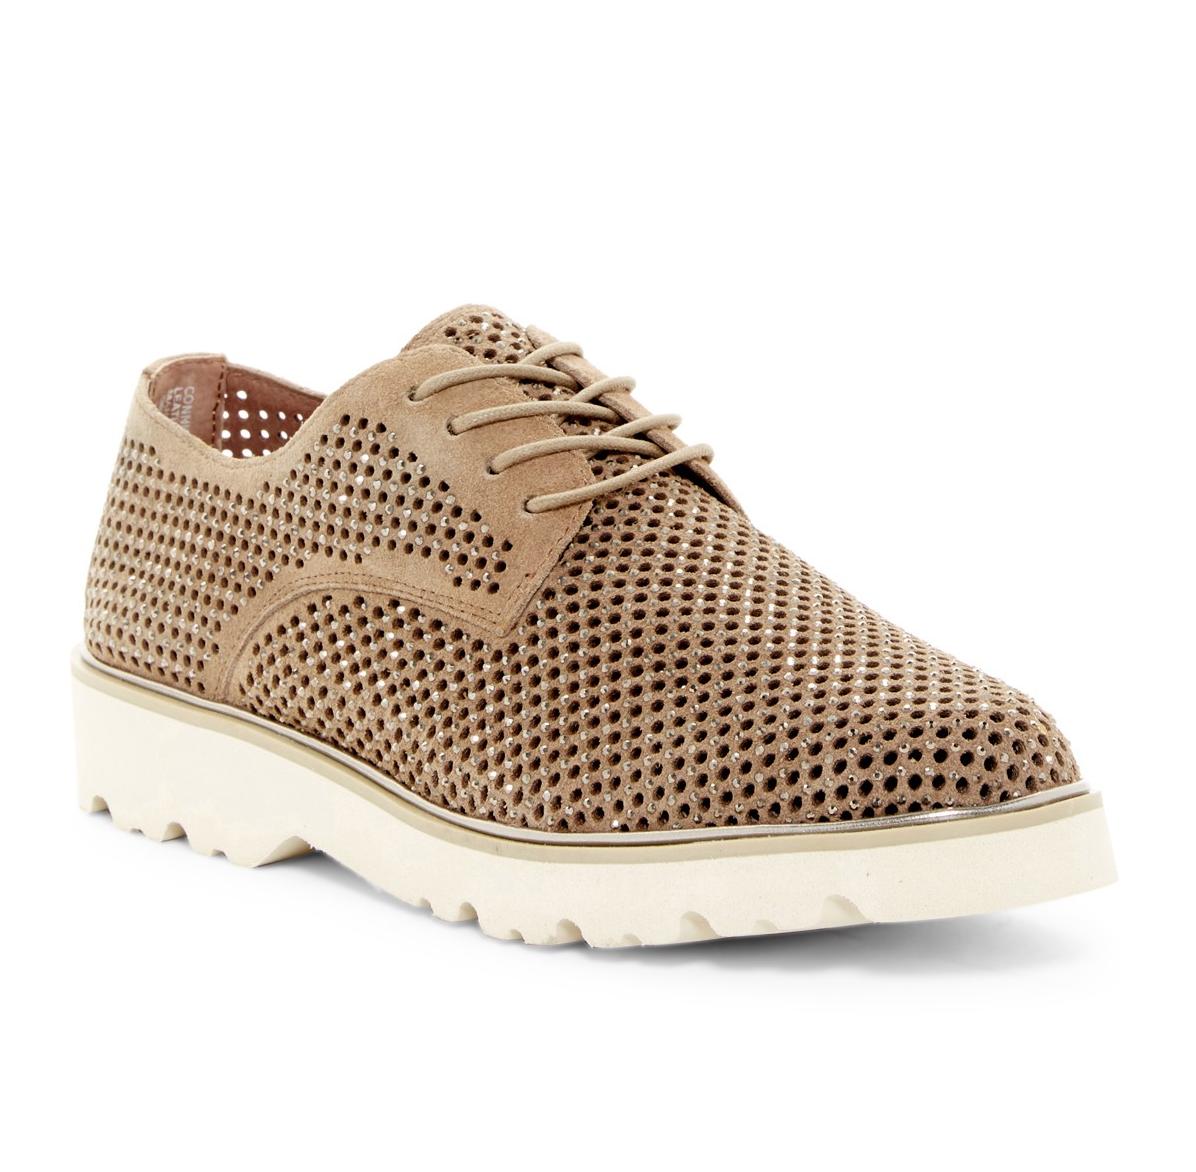 NEU DONALD PLINER Taupe CONNI Perforated Oxfords 7.5 M 228 NIB connisp sneaker